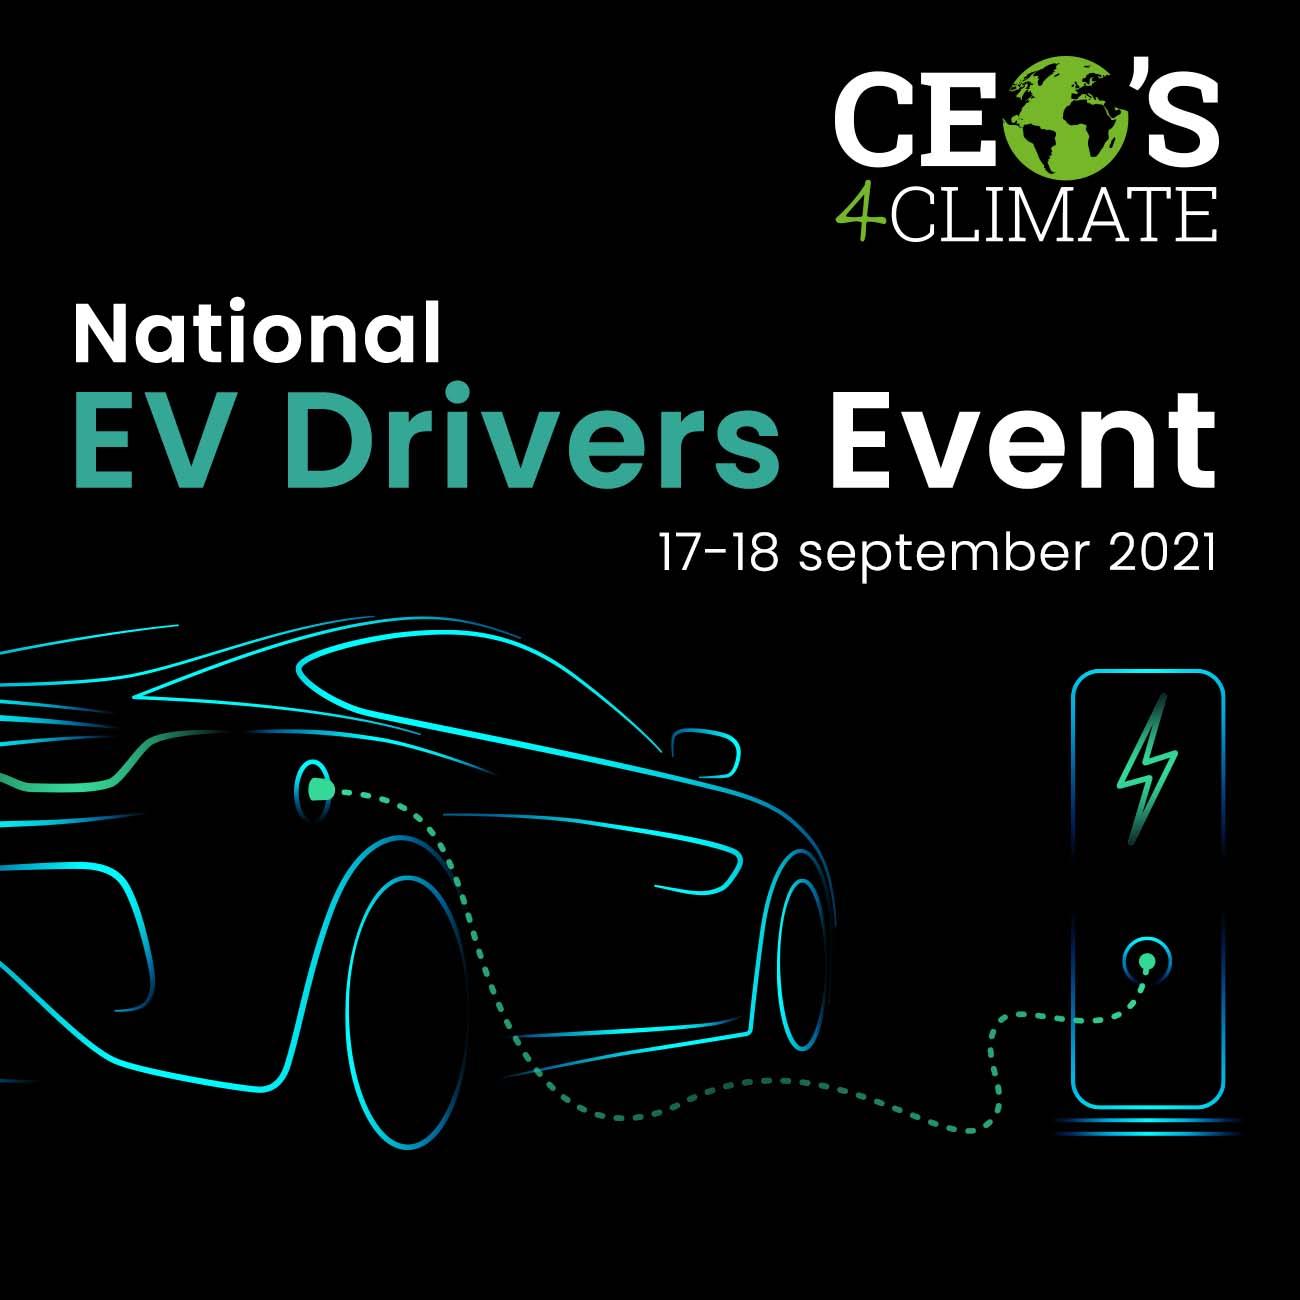 National EV Drivers Event